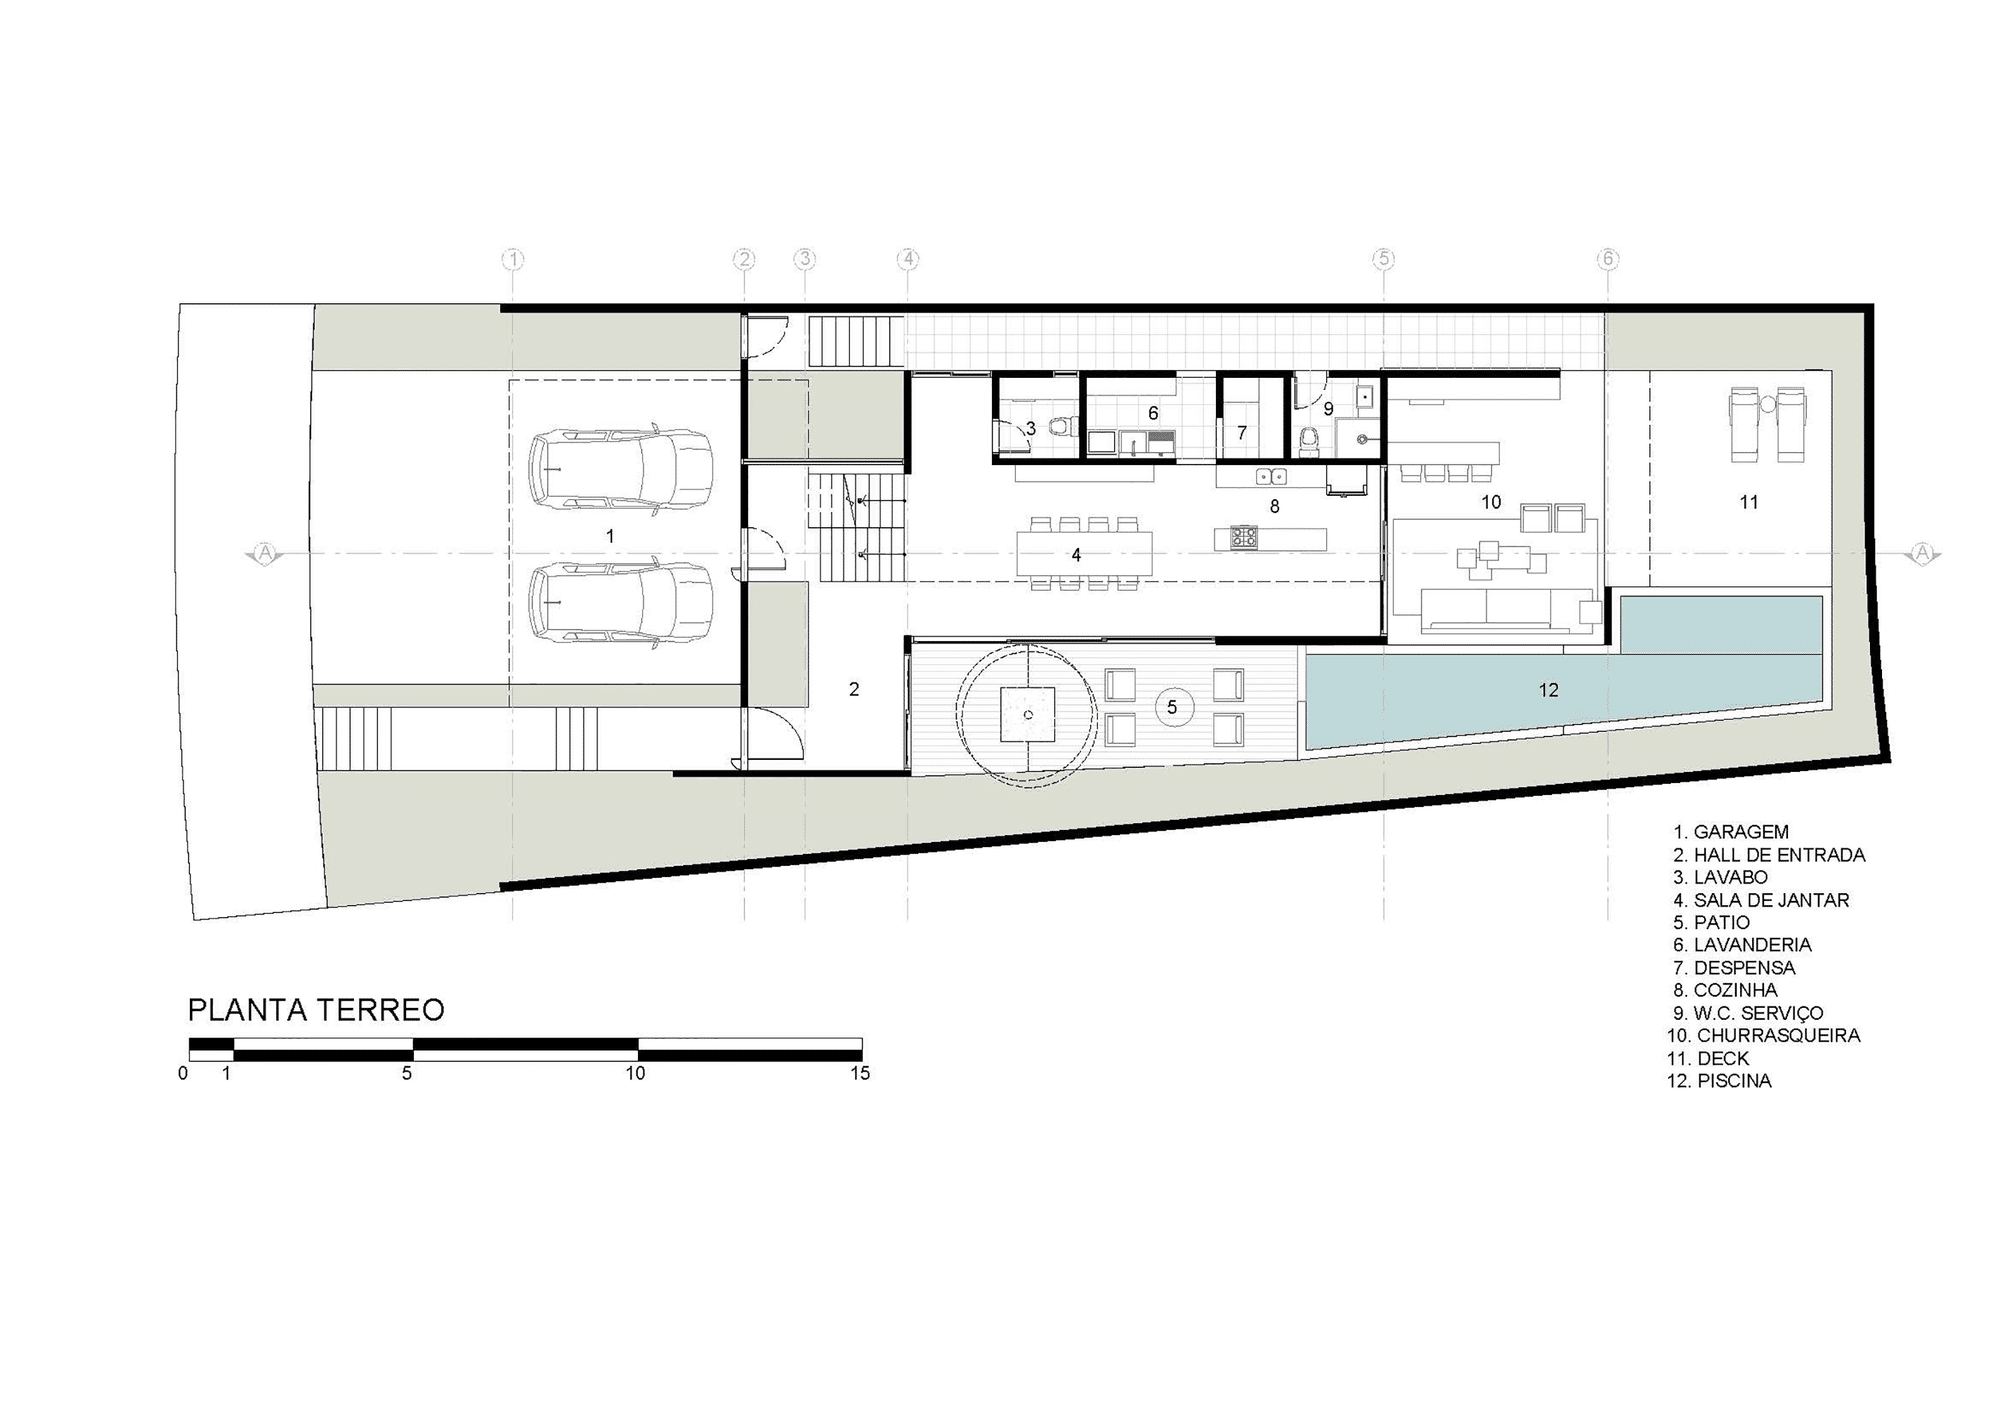 Dise o de moderna casa de dos pisos con fachada y planos for Plantas arquitectonicas minimalistas